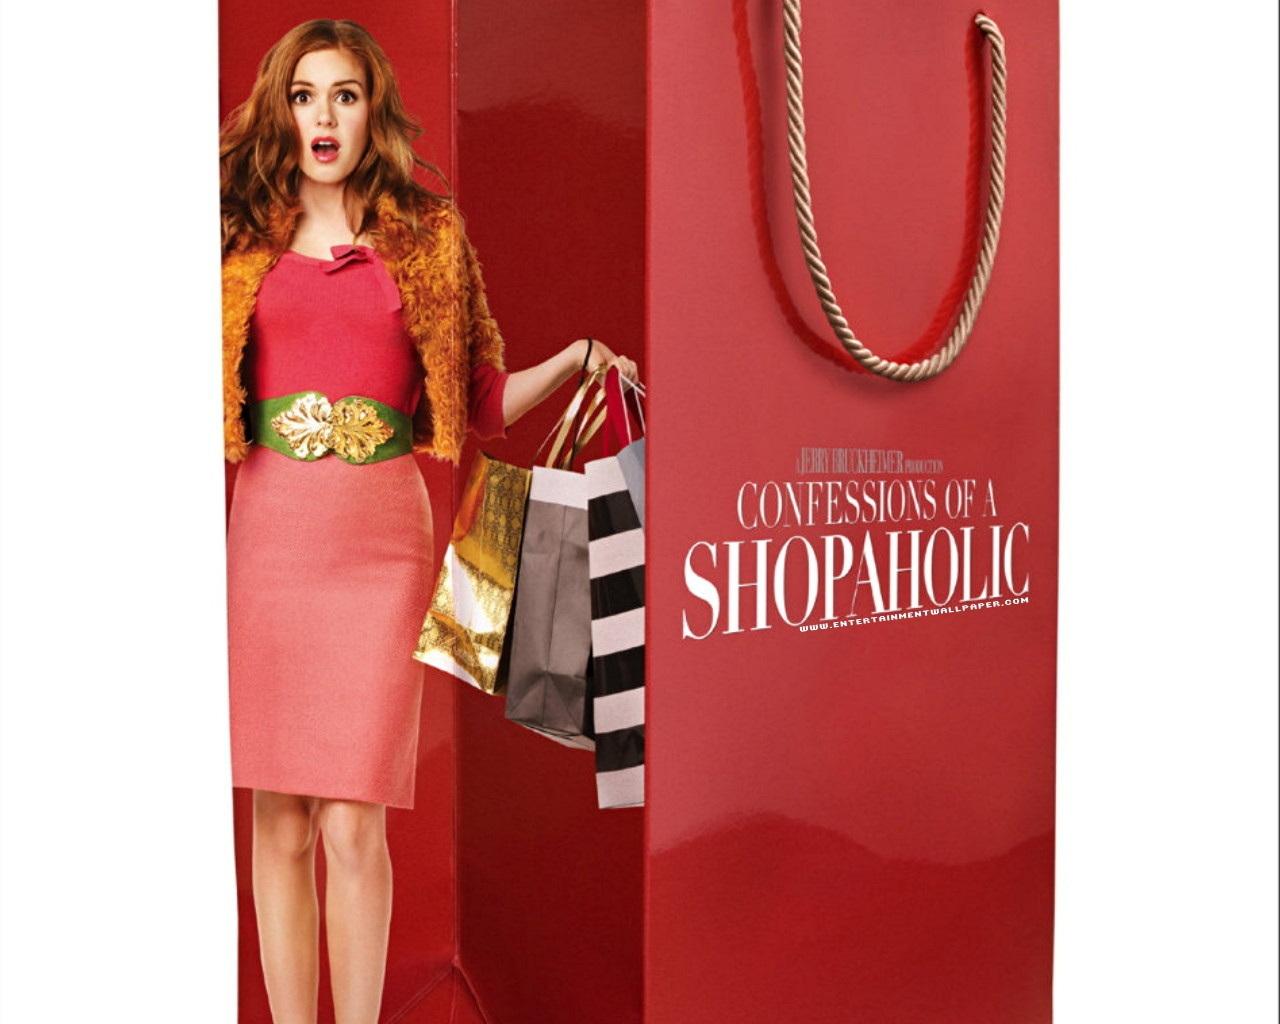 Confessions of a Shopaholic   Confessions of a Shopaholic Movie 1280x1024